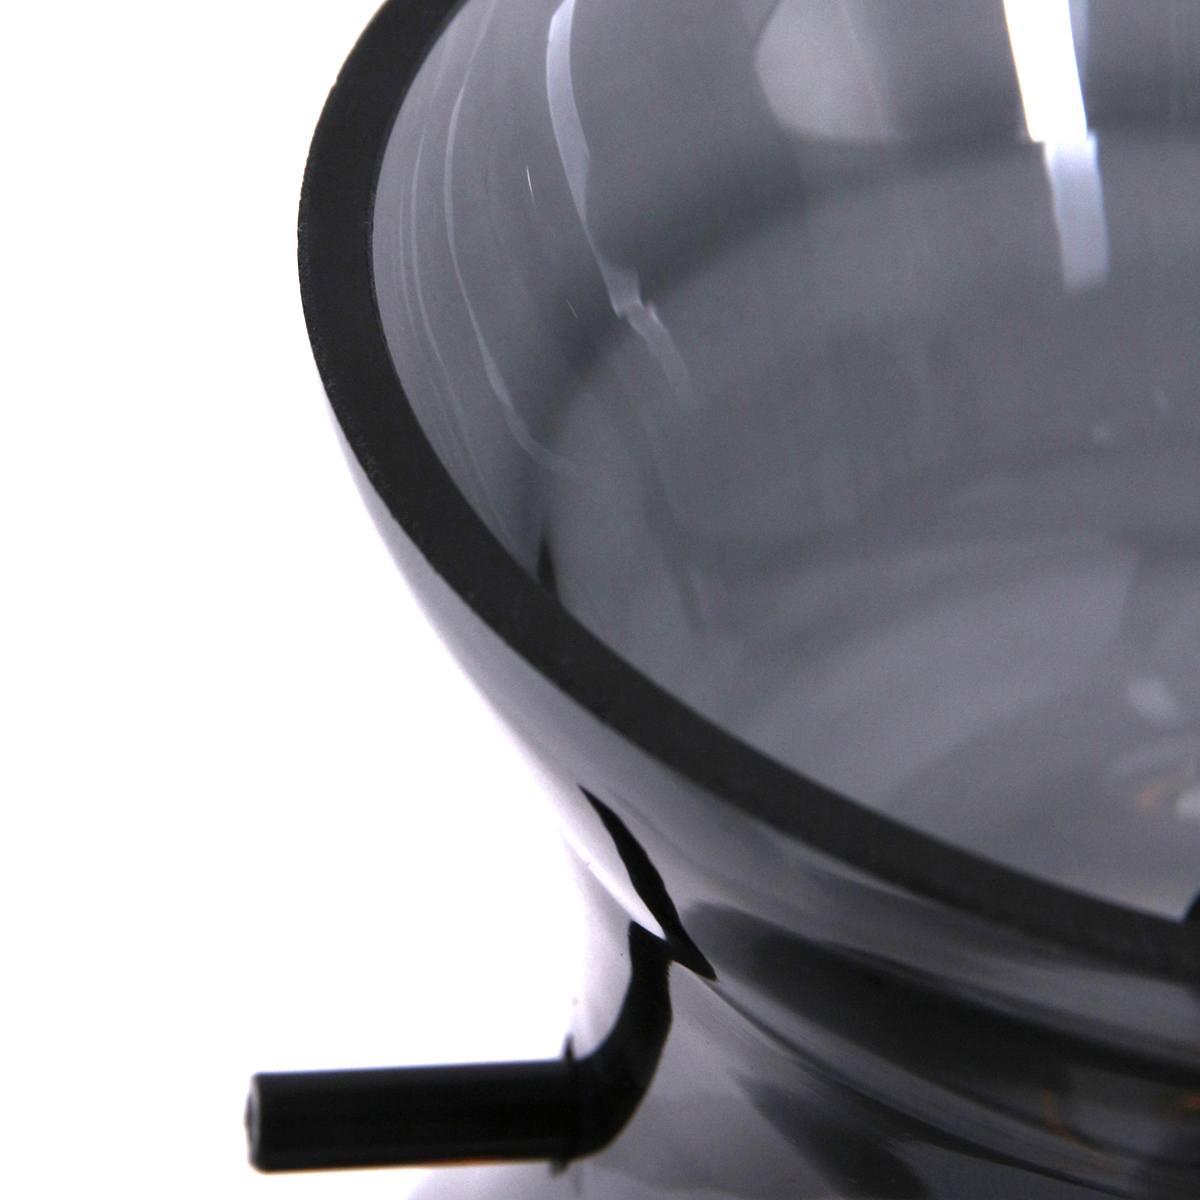 Hanglamp 1-lichts E27 60W grey glass ANNE LIGHTING - 1454ZW - Hanglamp- Anne Lighting- Chalise day & night- Retro - Landelijk- Zwart  - Glas Metaal